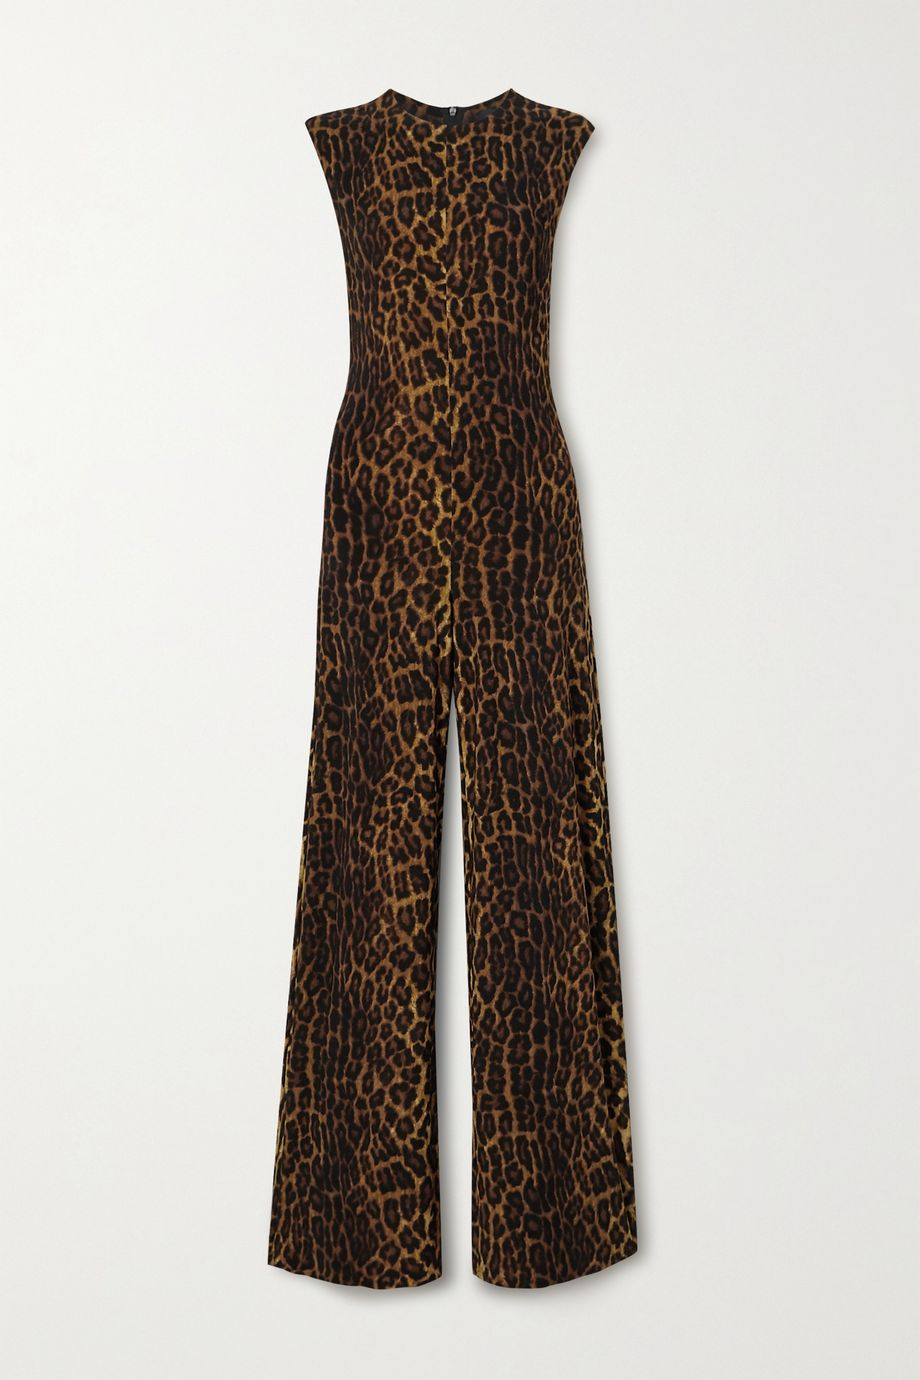 Norma Kamali Leopard-print stretch-jersey jumpsuit